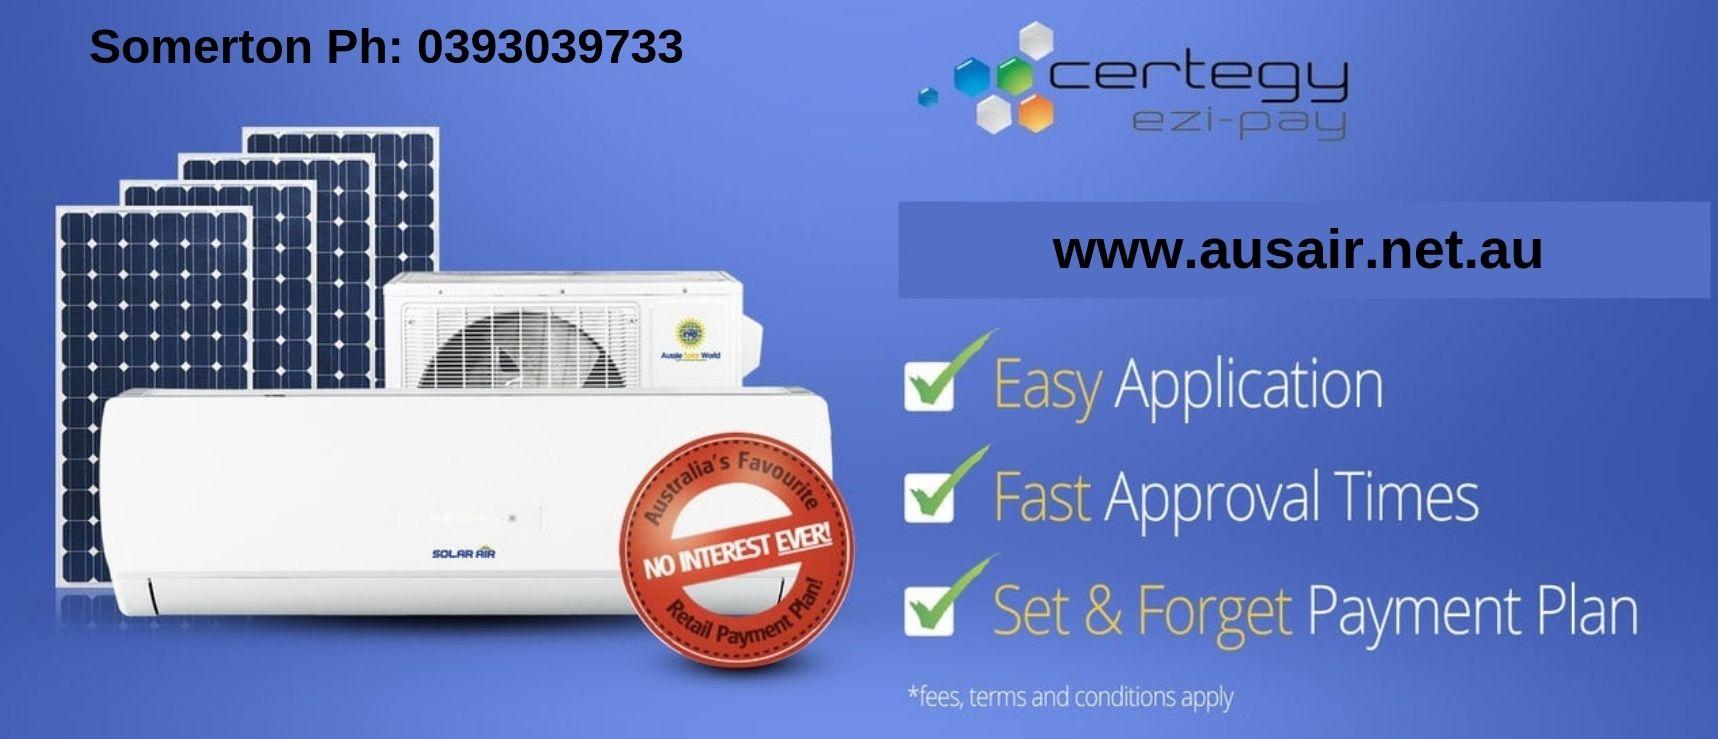 Ausair Originated As Air Conditioner And Home Appliances Services